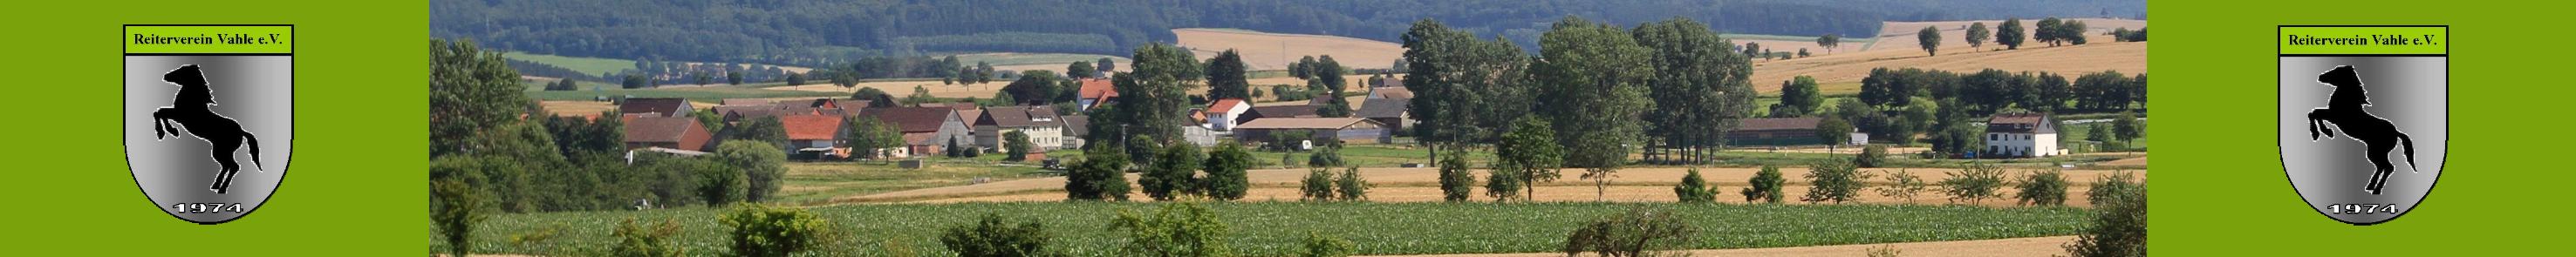 Reiterverein Vahle